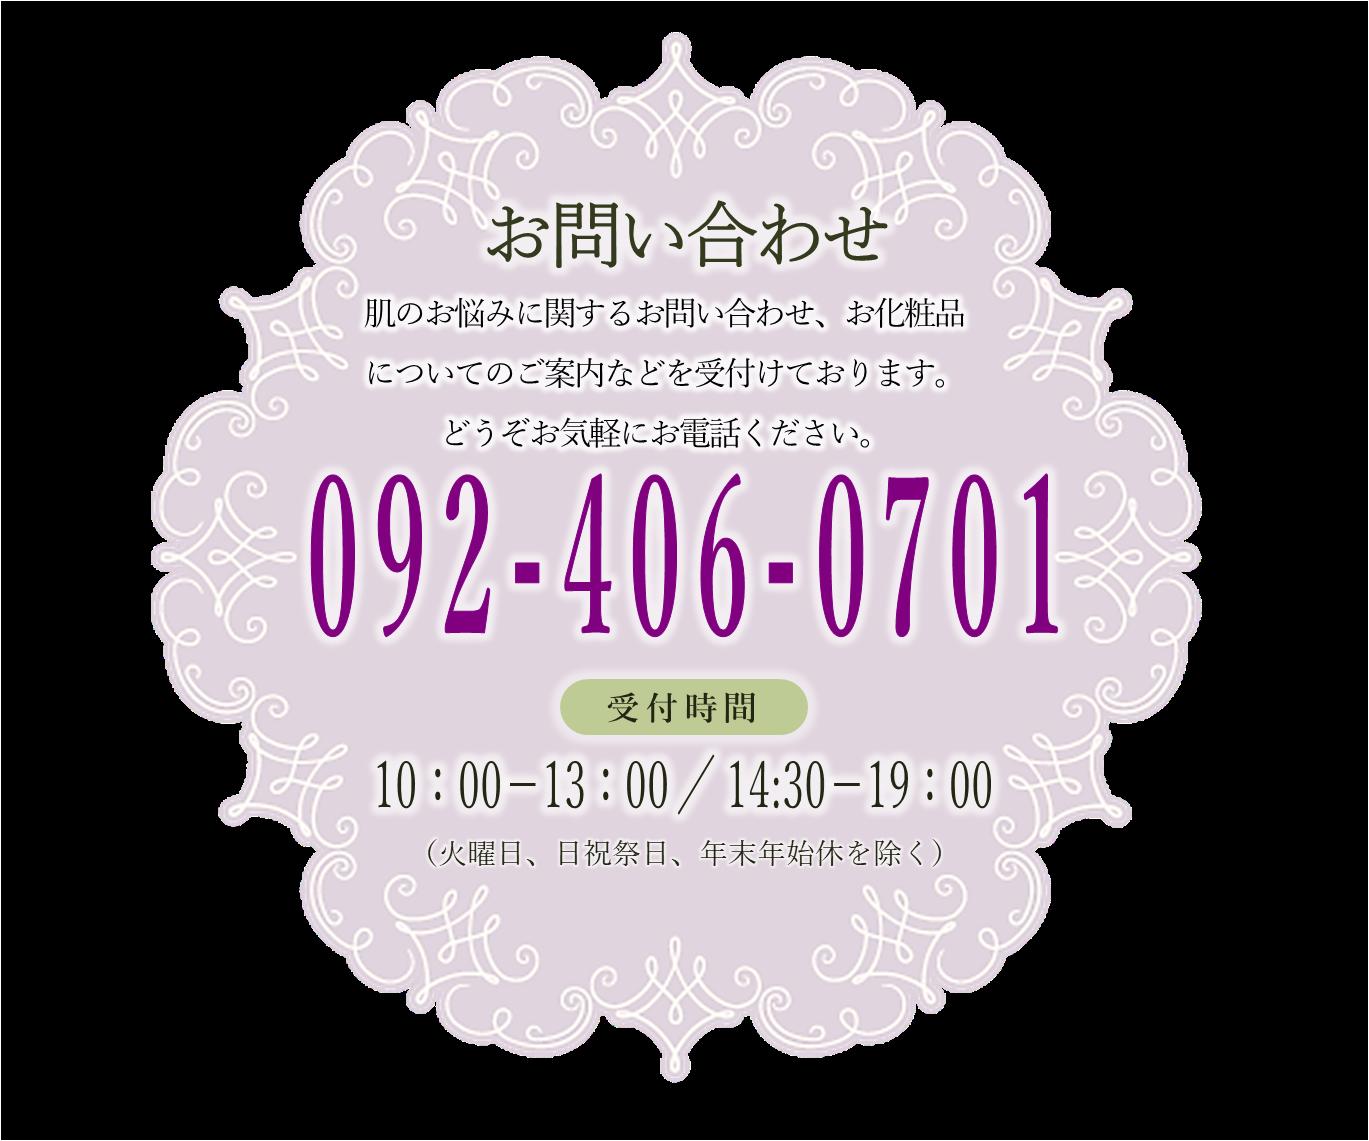 092-406-0701